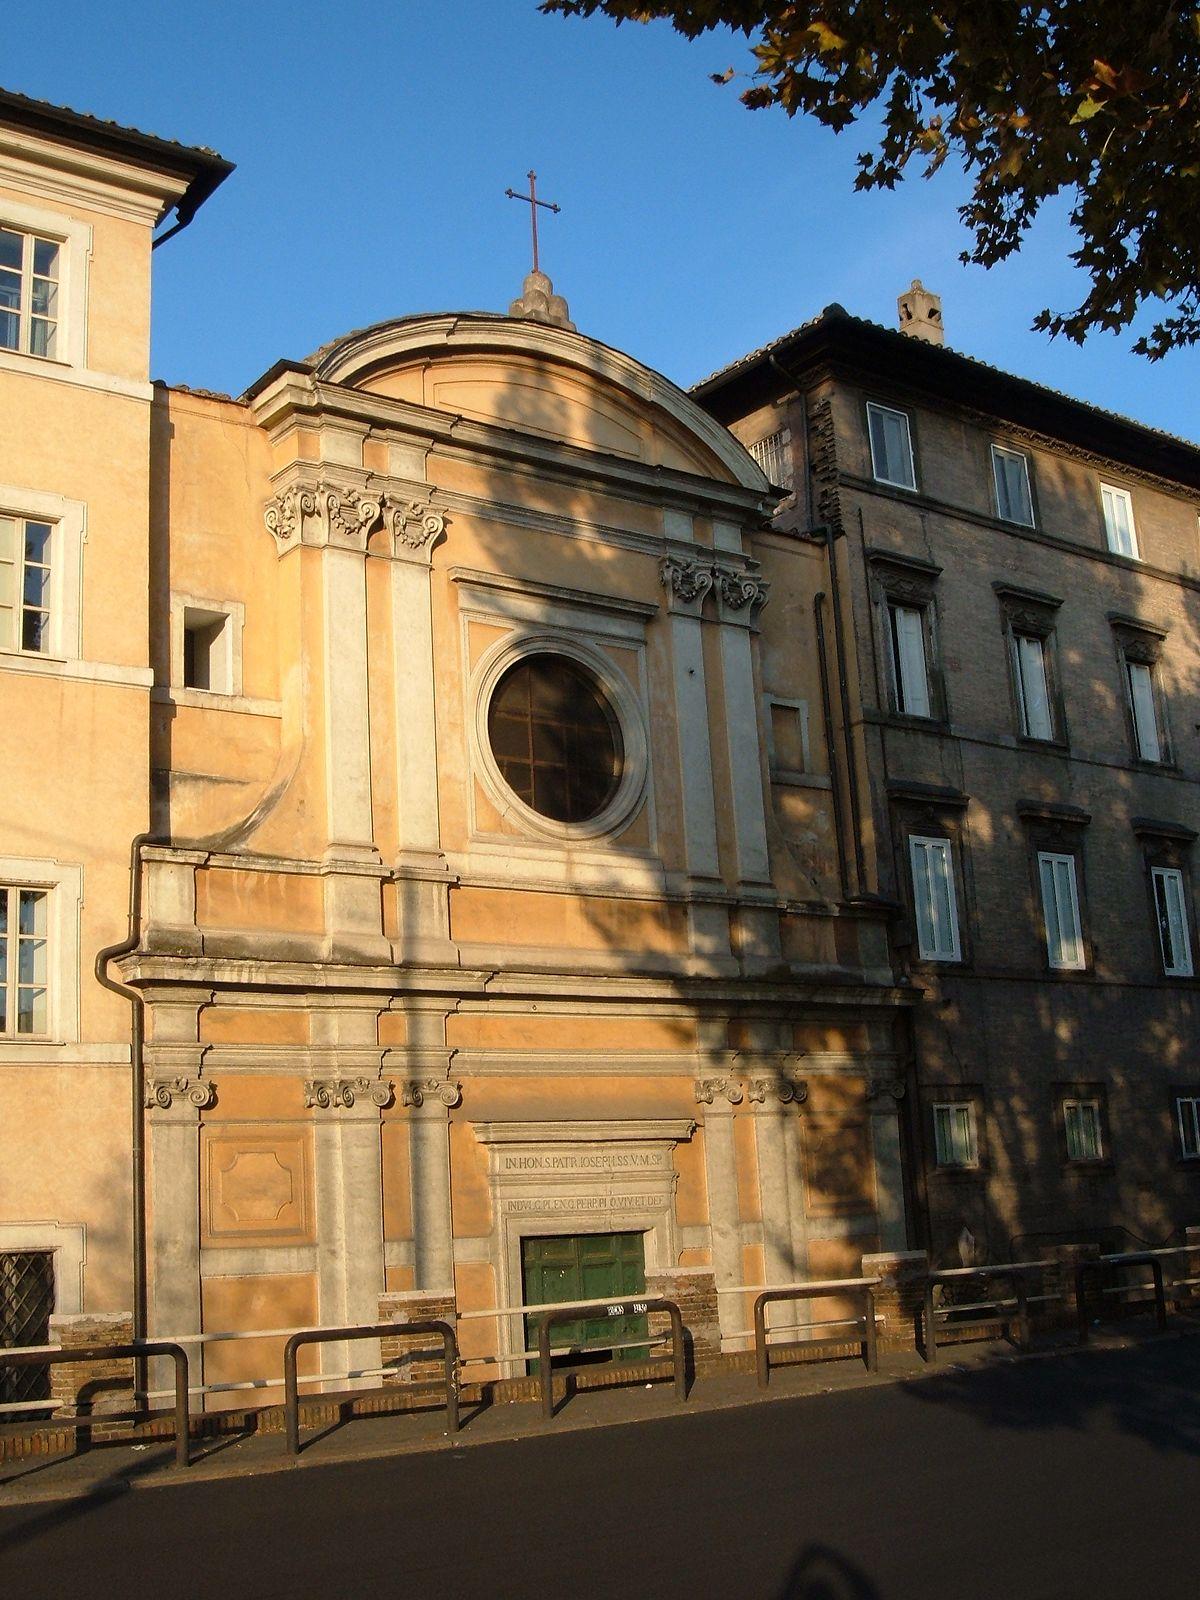 Chiesa di san giuseppe alla lungara wikipedia for Di giuseppe arredamenti roma